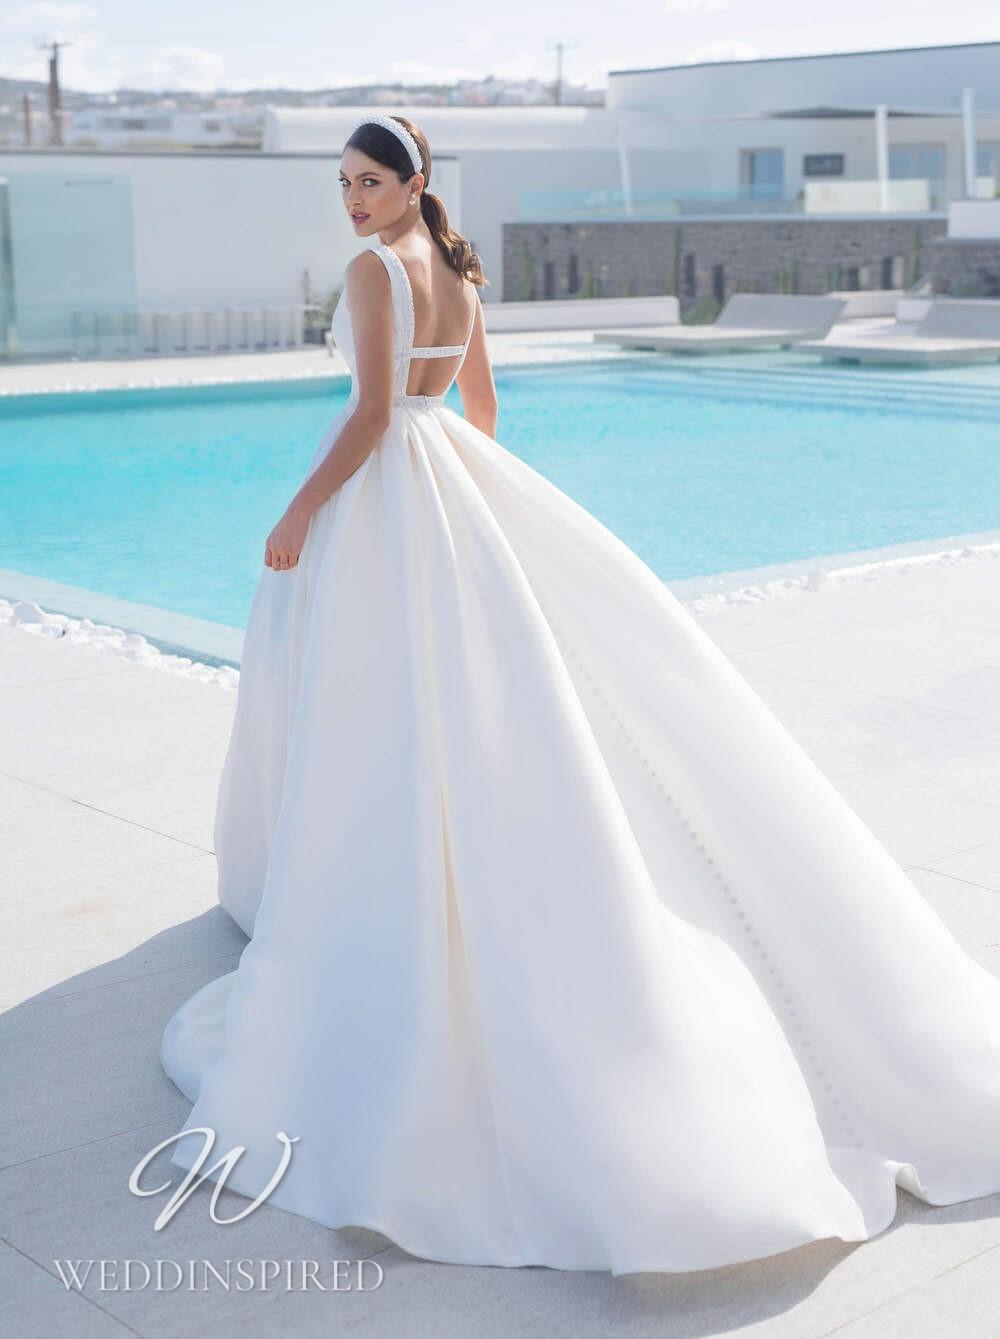 A Blunny 2021 backless satin A-line wedding dress